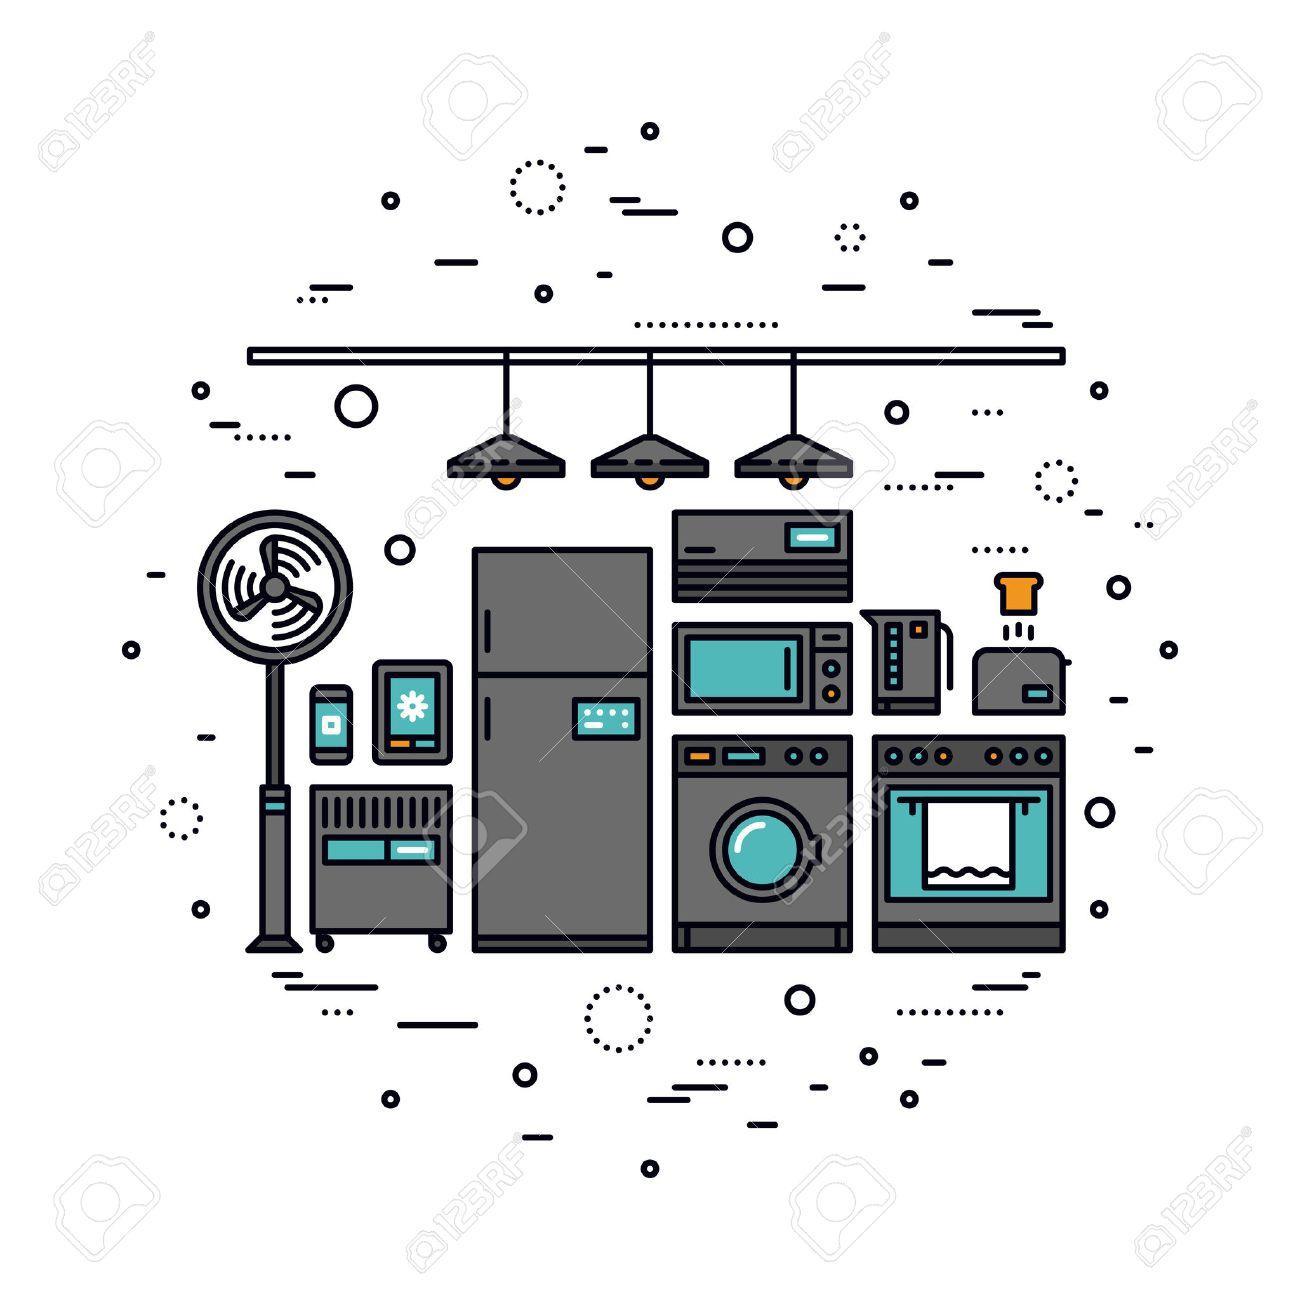 Thin Line Flat Design Of Smart Home Appliances, Future Digital ...